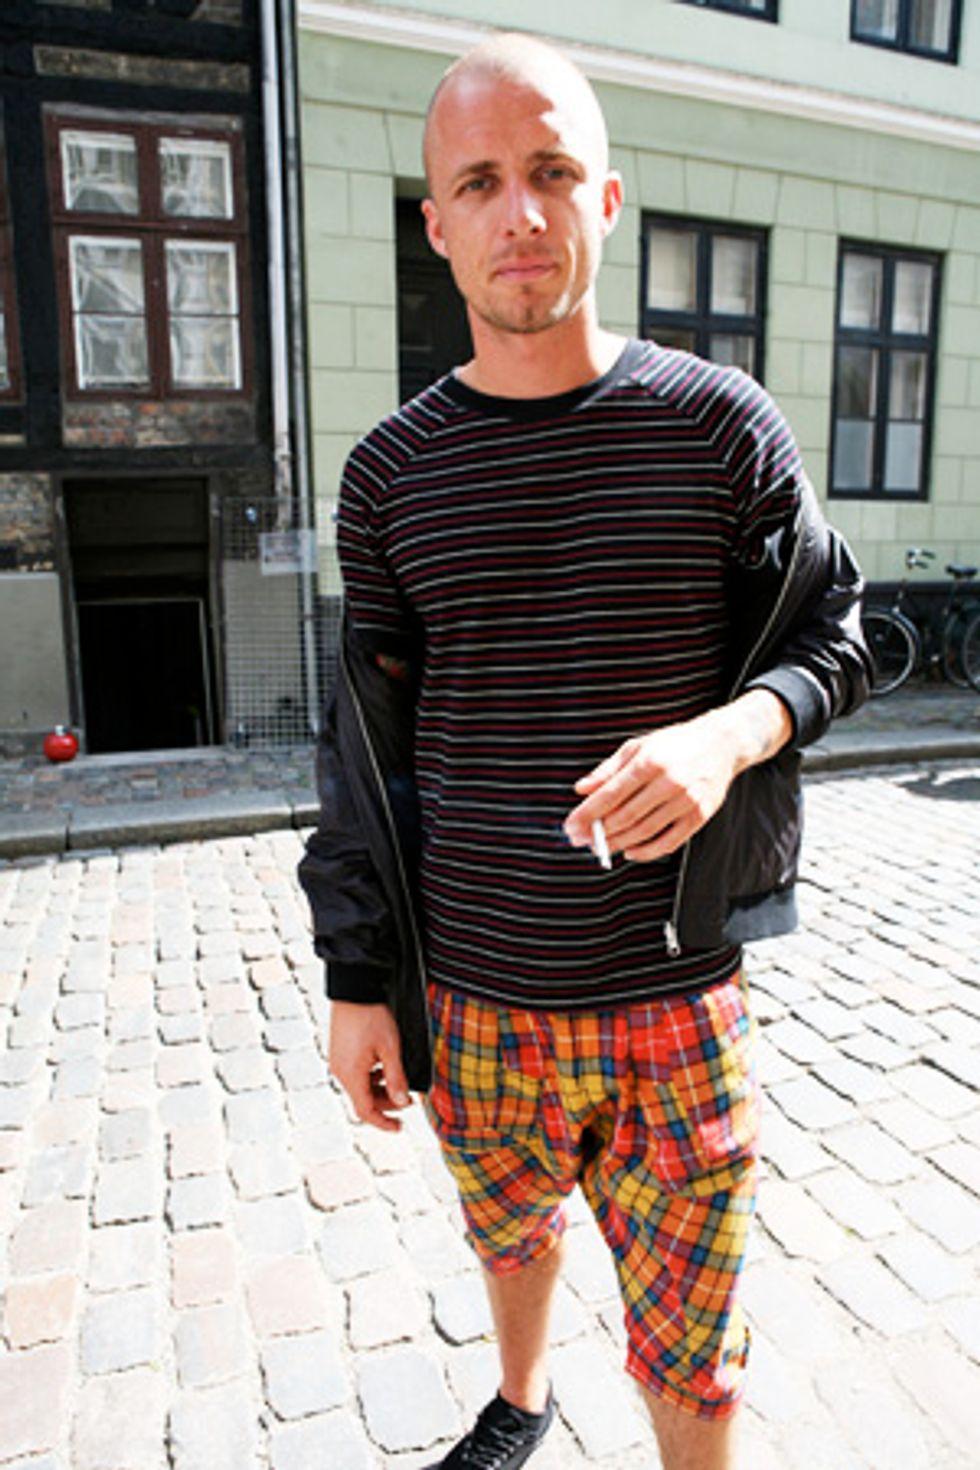 Introducing JD Ferguson's Guide to the Hot Boys of Copenhagen